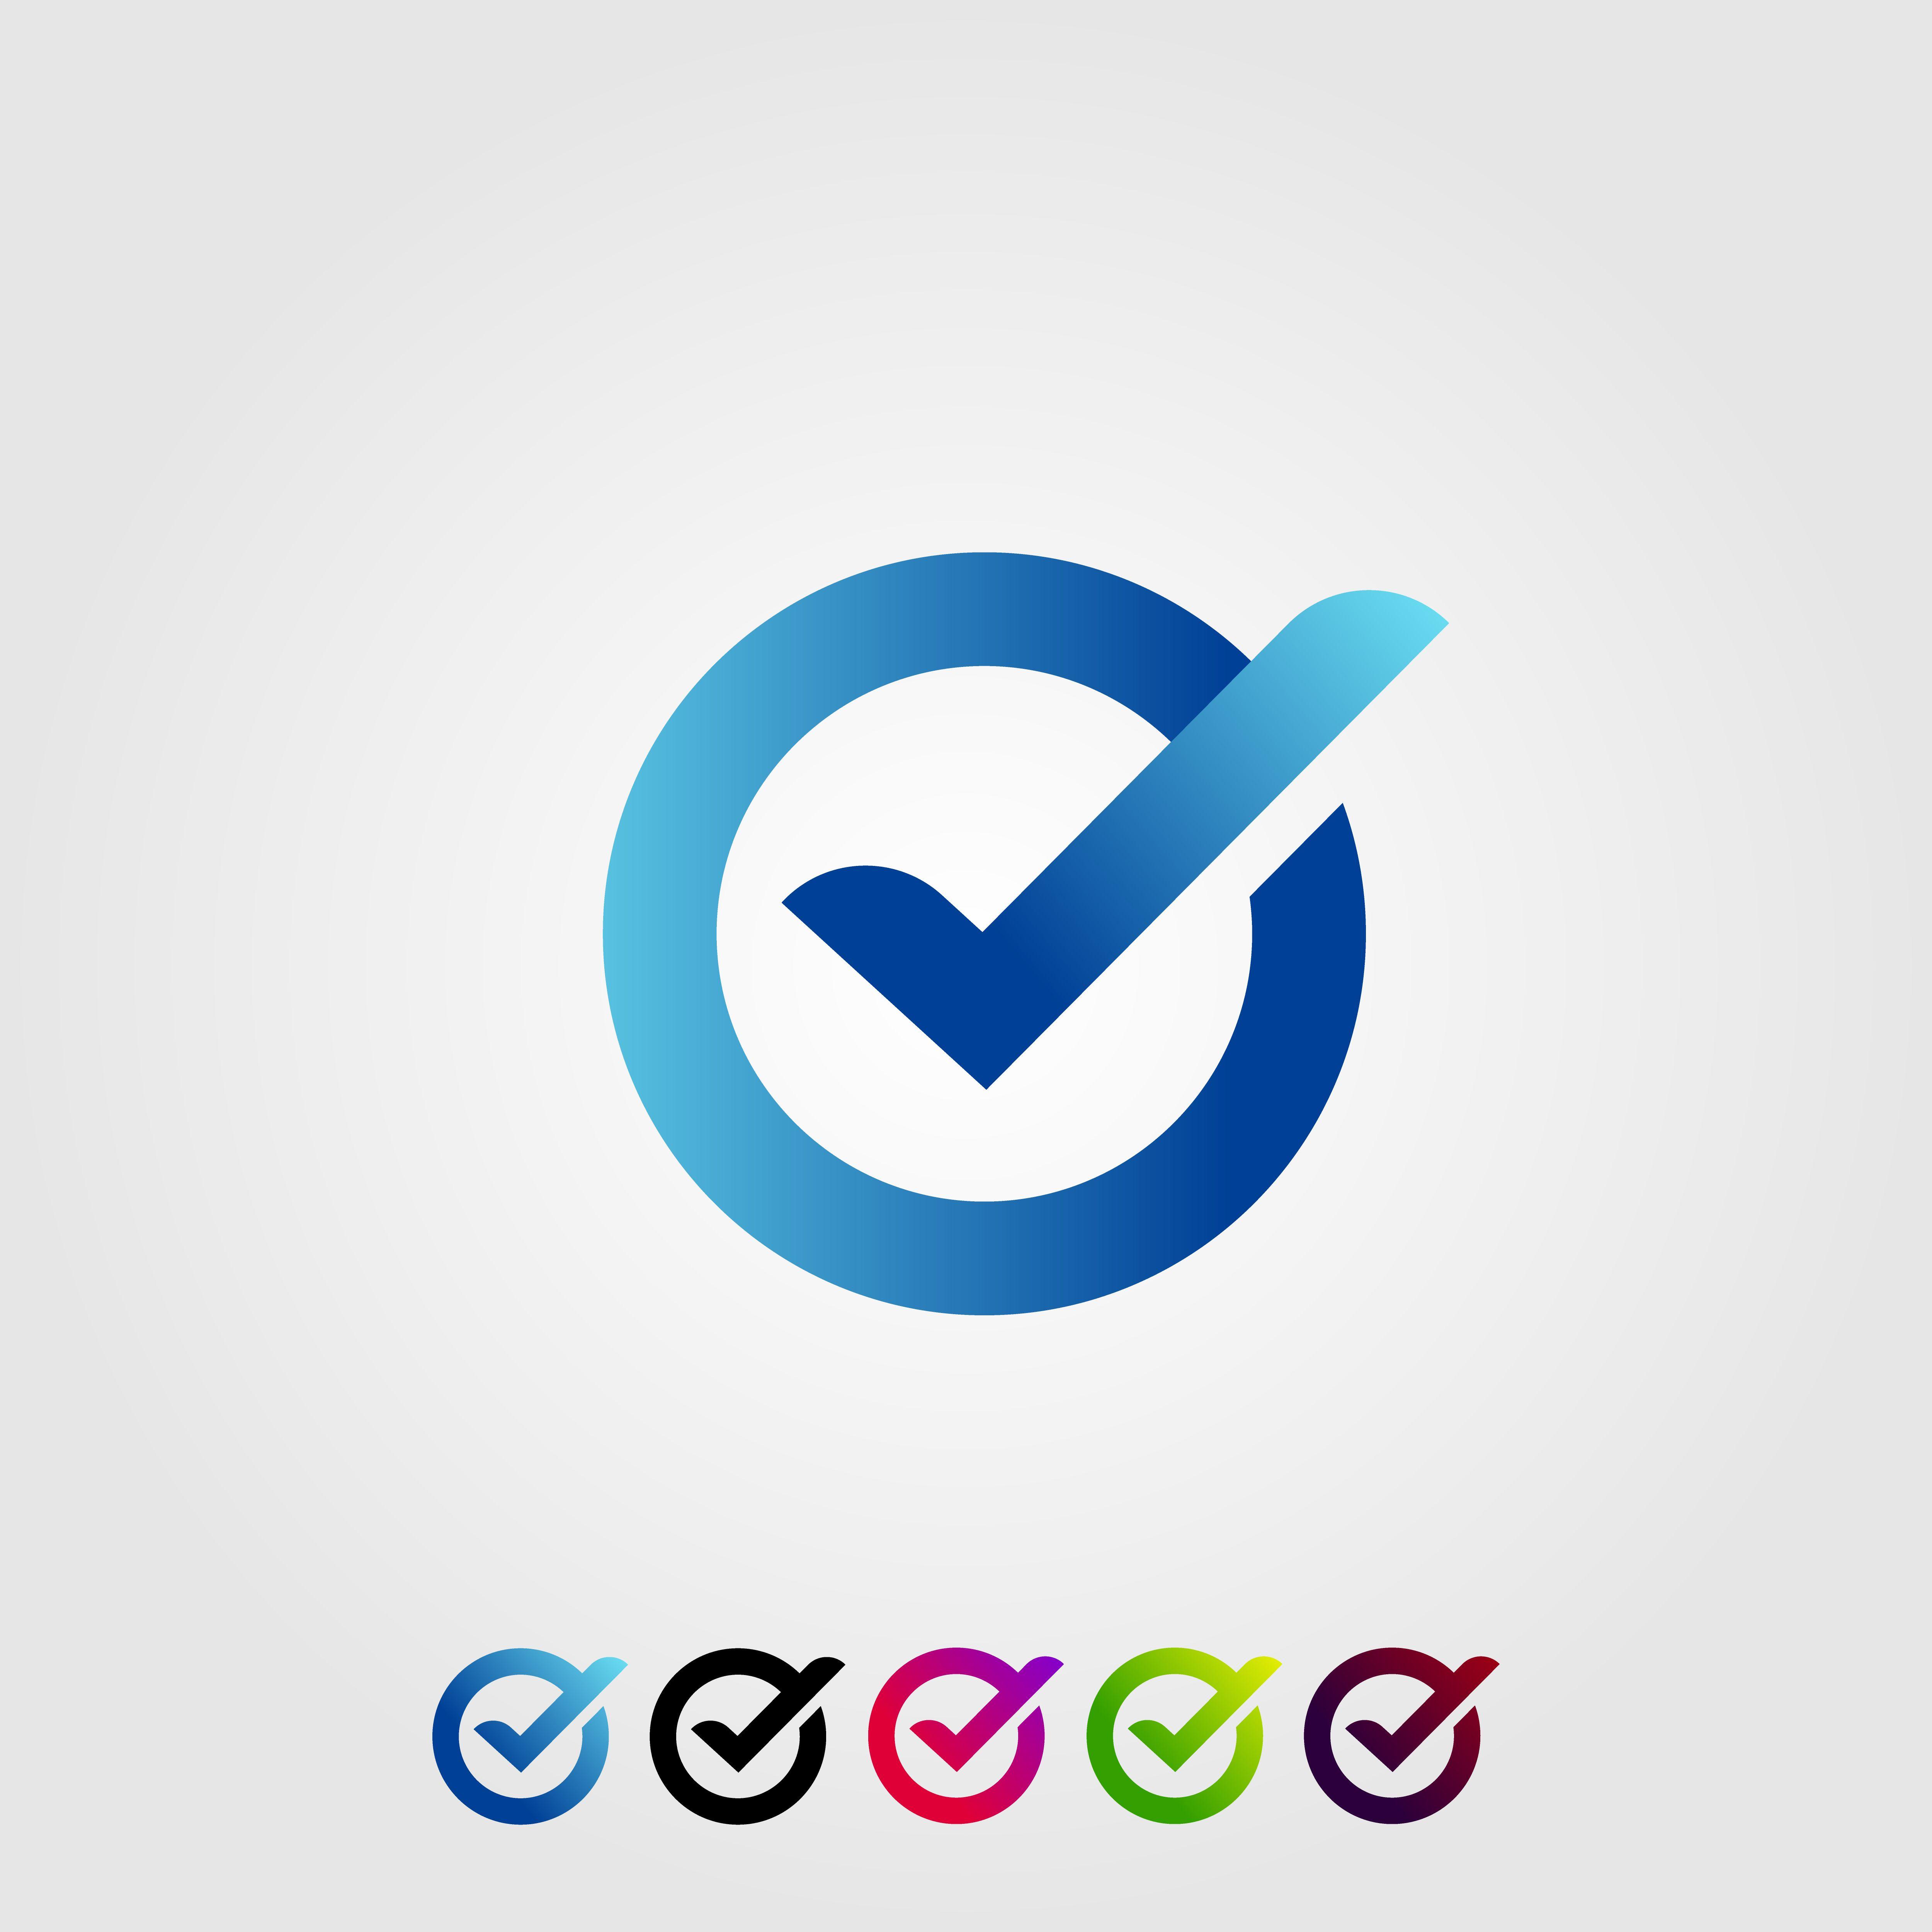 letter, o, check, verified, modern, logo, design, icon